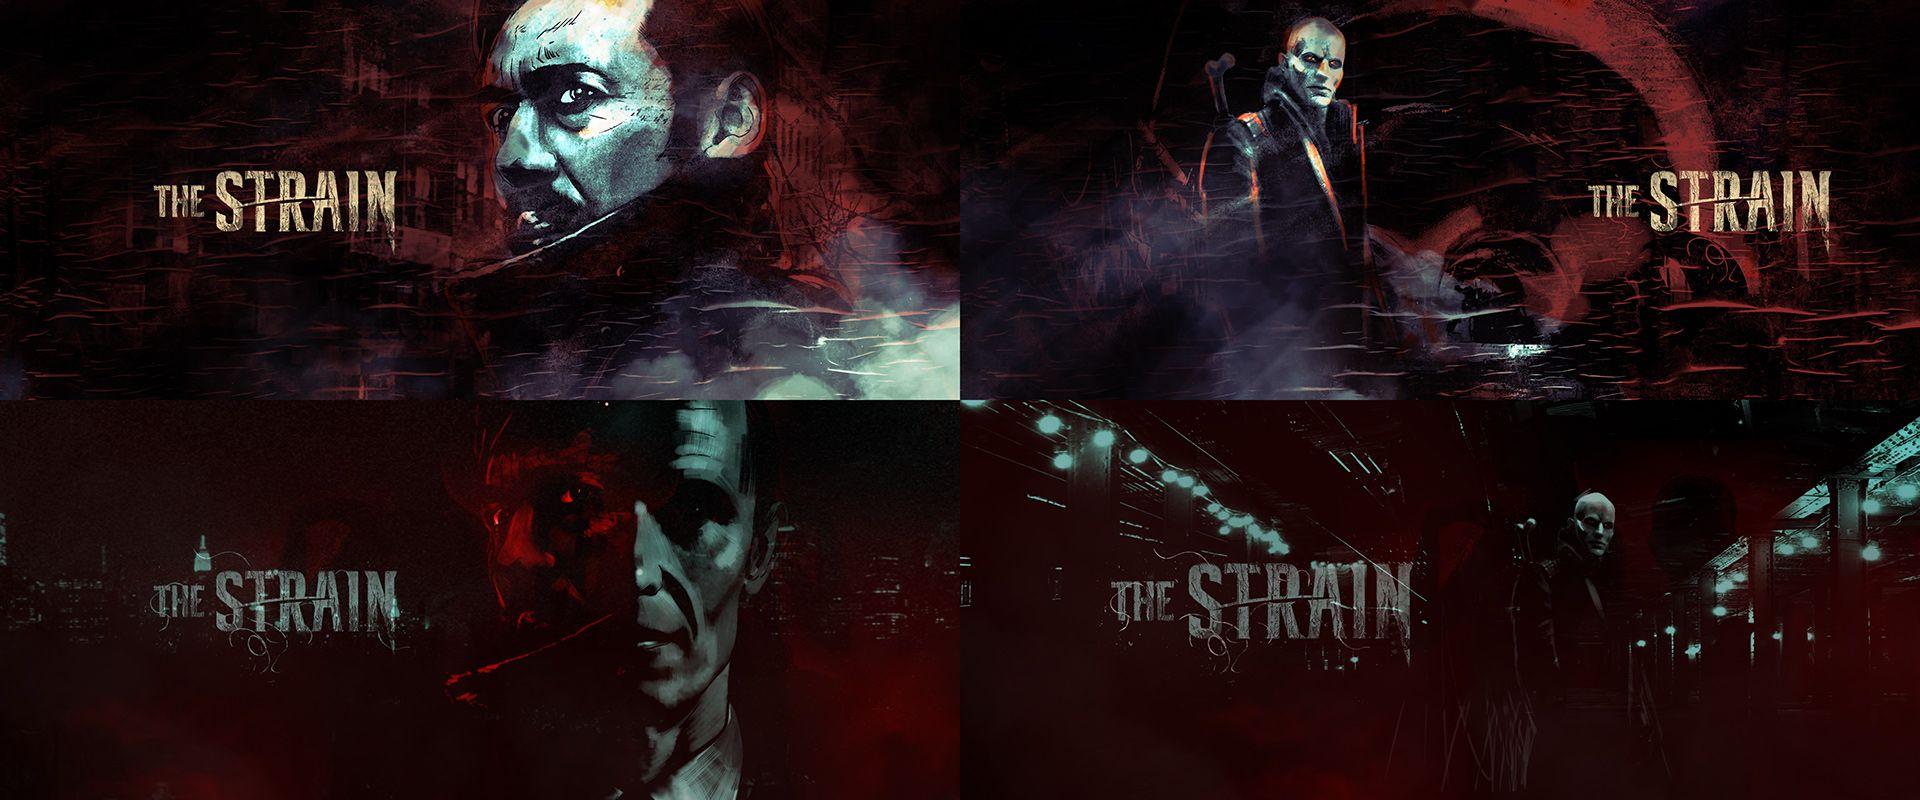 Design Exploration - The Strain